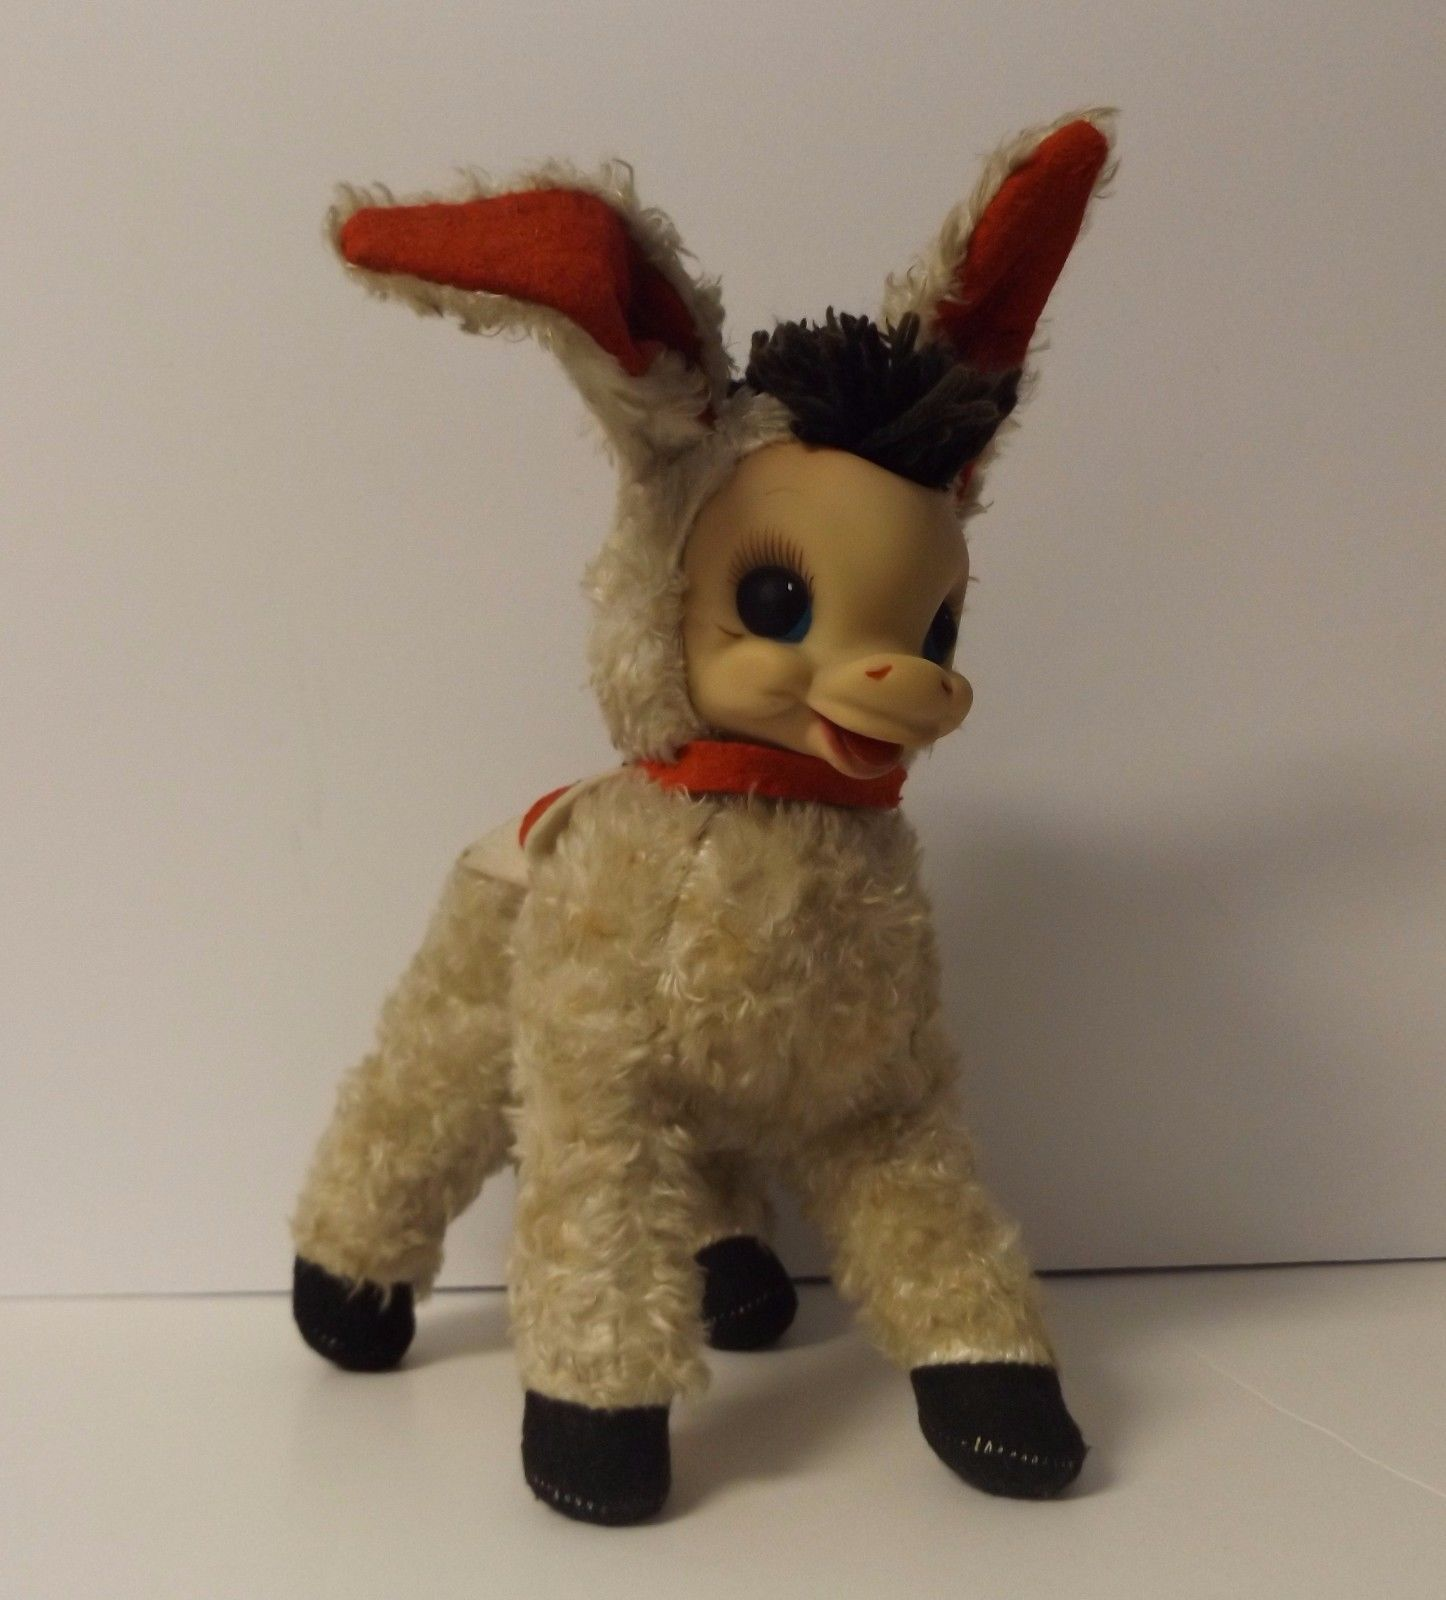 Vintage rushton star creation htf donkey - very good condition ...